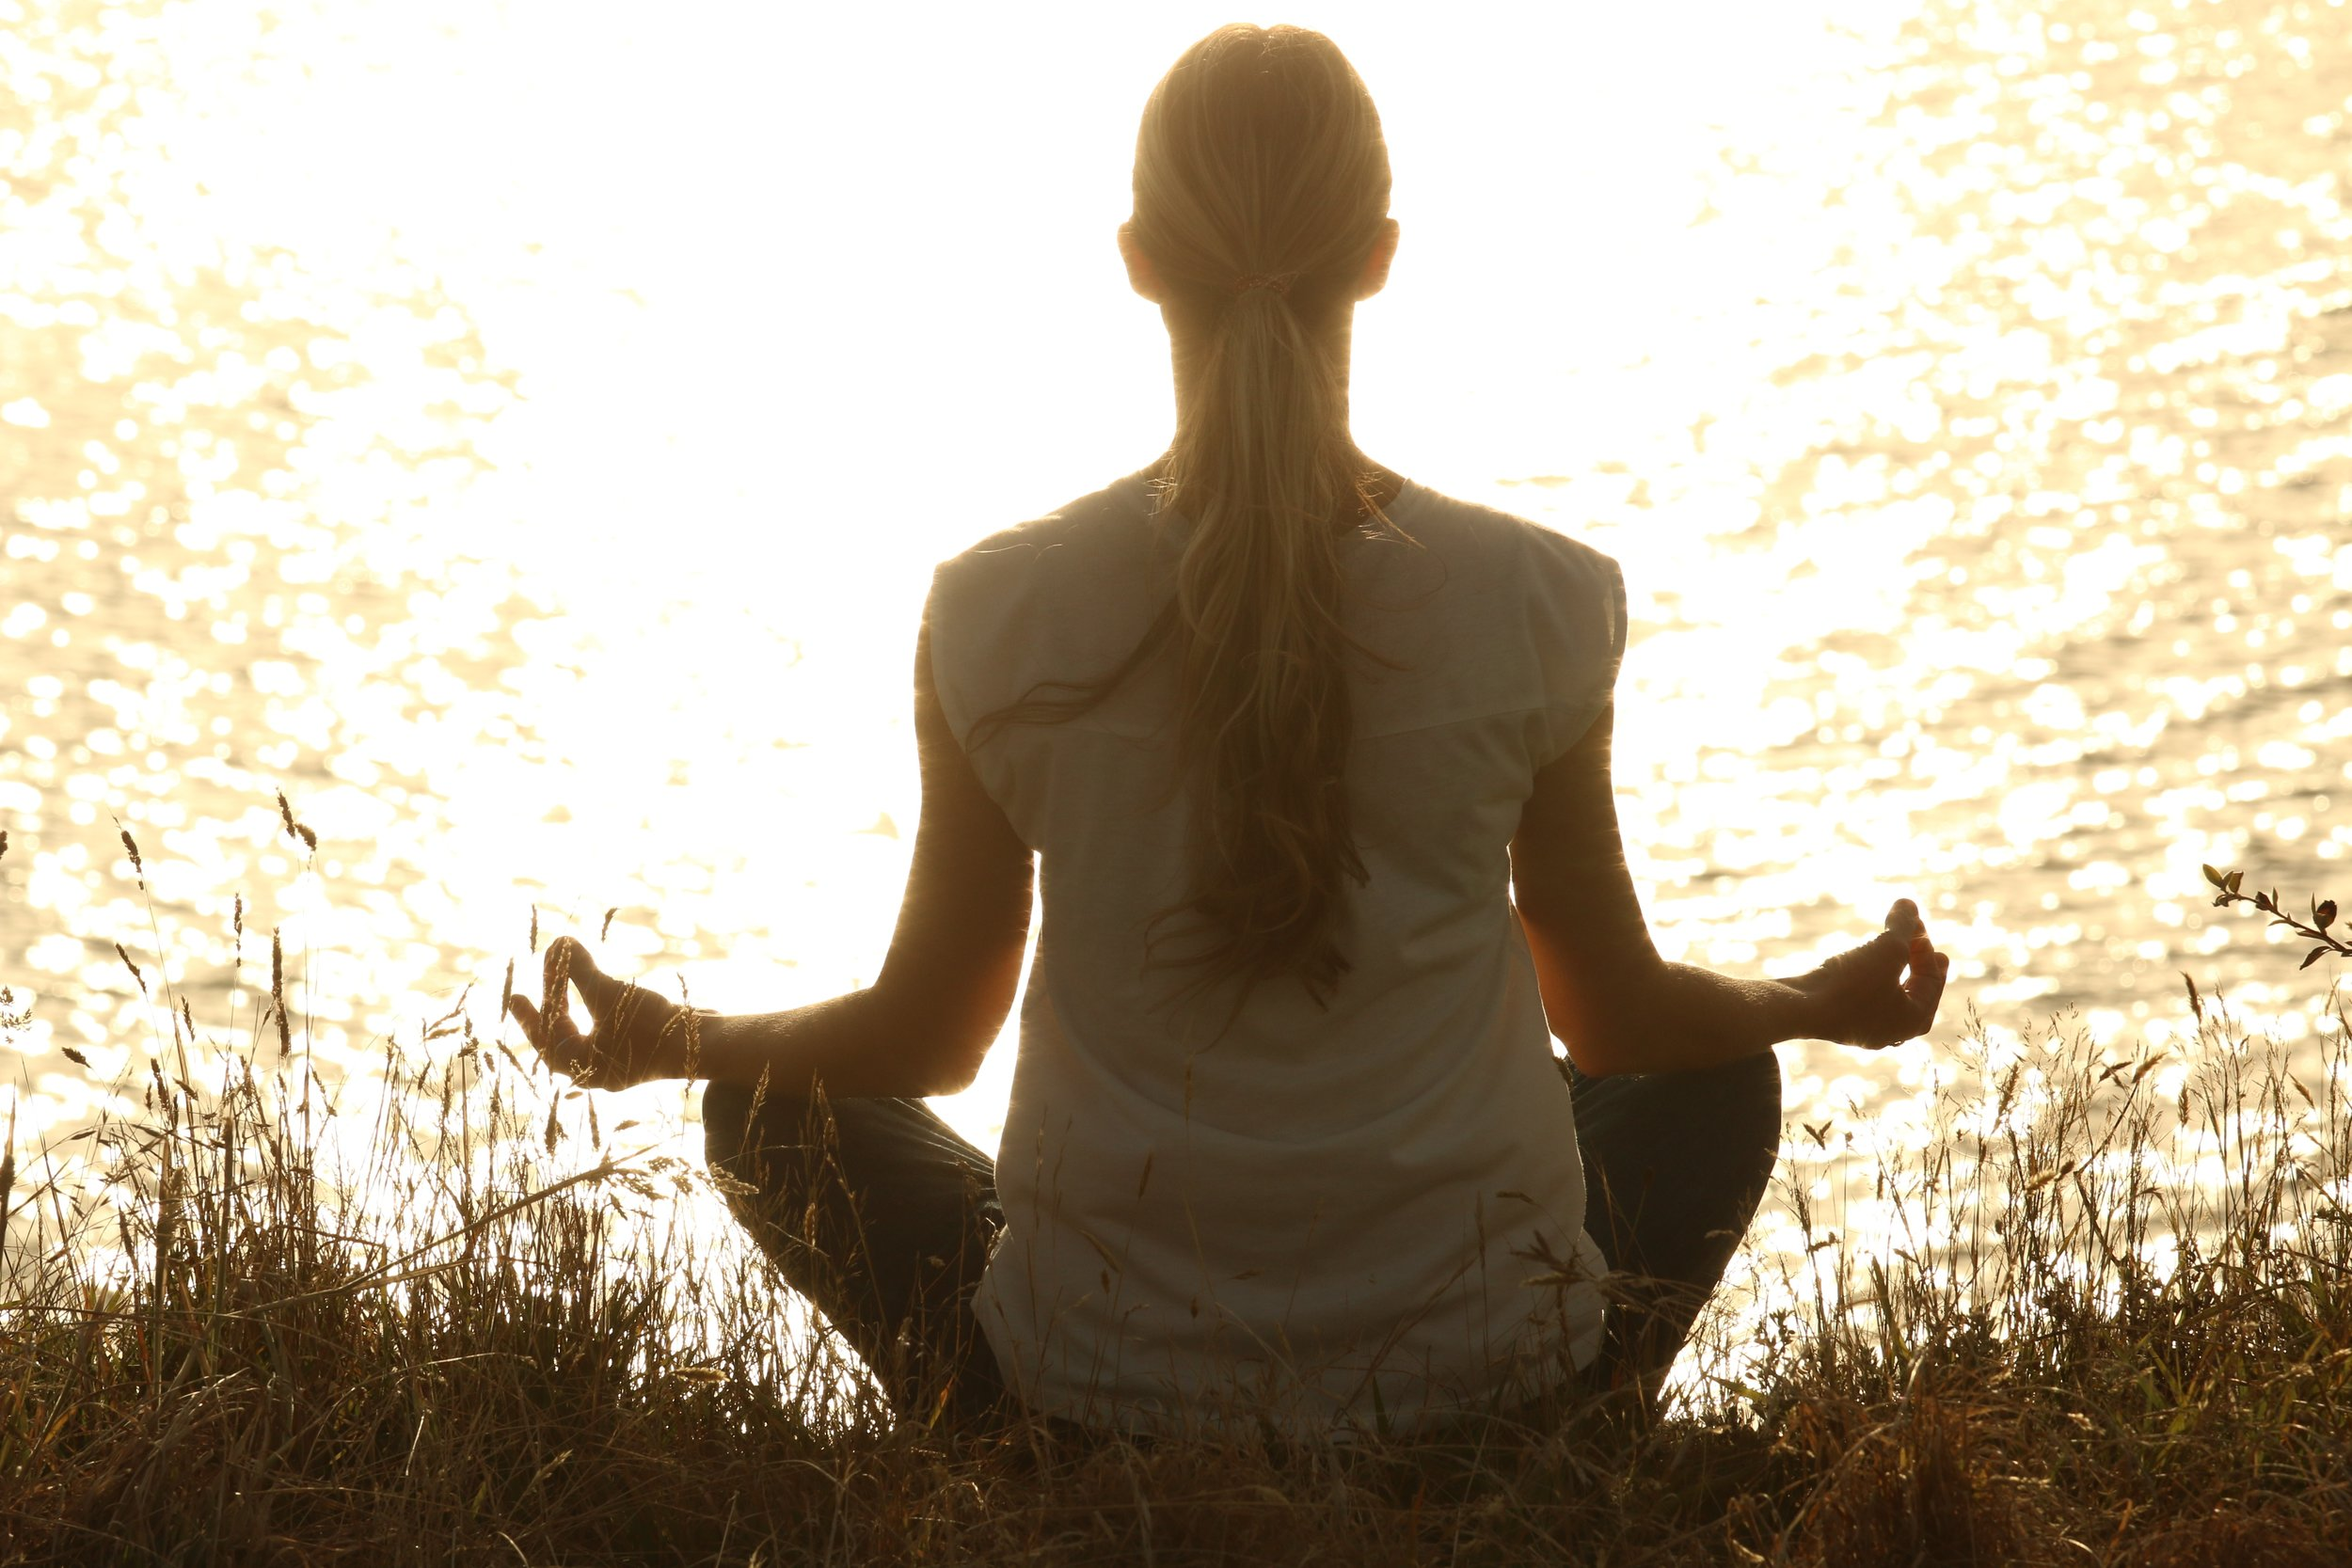 uwm.meditate.person-sunset-sunlight-morning-love-tranquil-1175713-pxhere.com